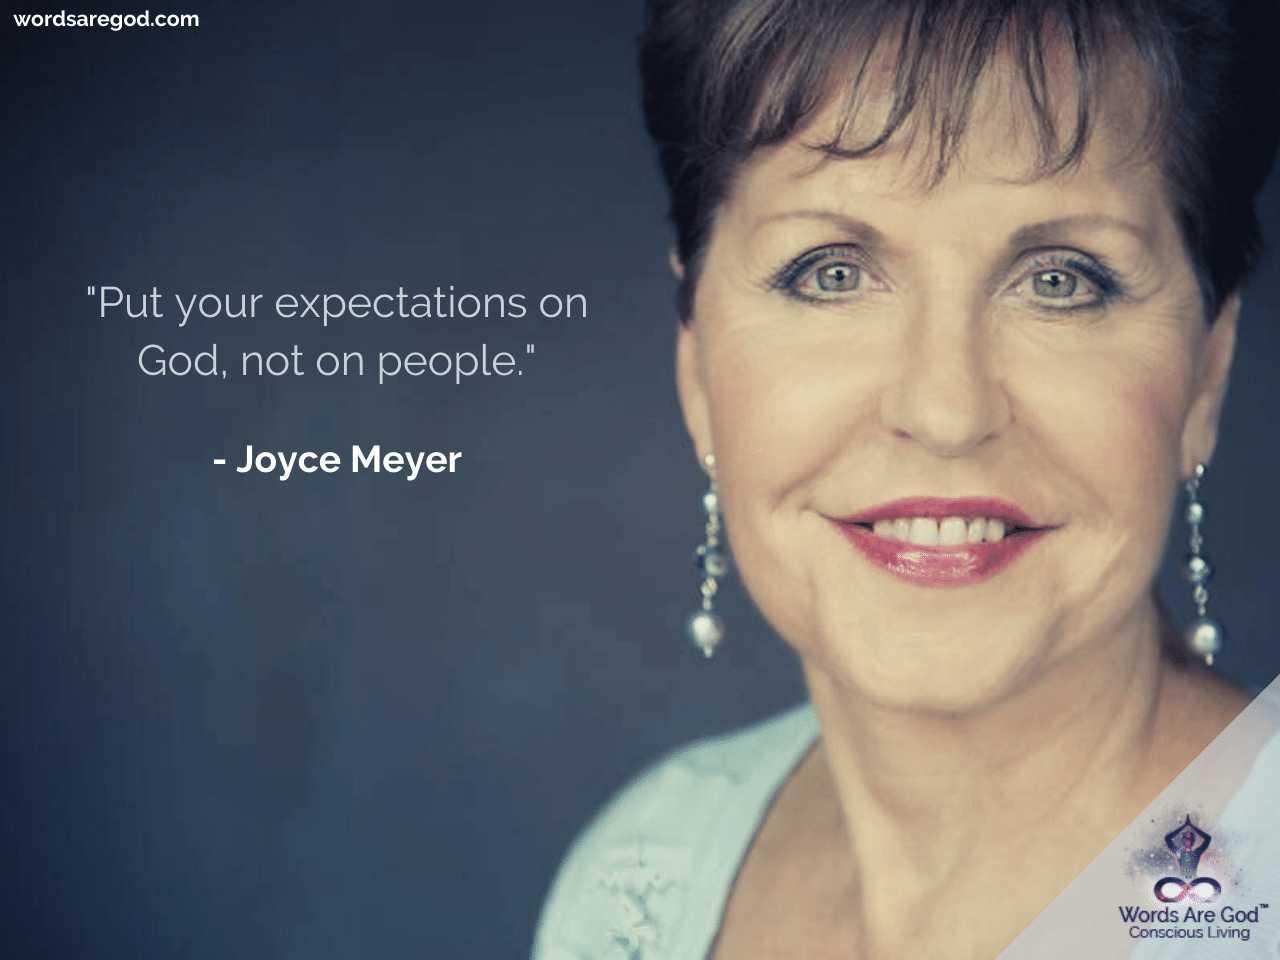 Joyce Meyer Inspirational Quote